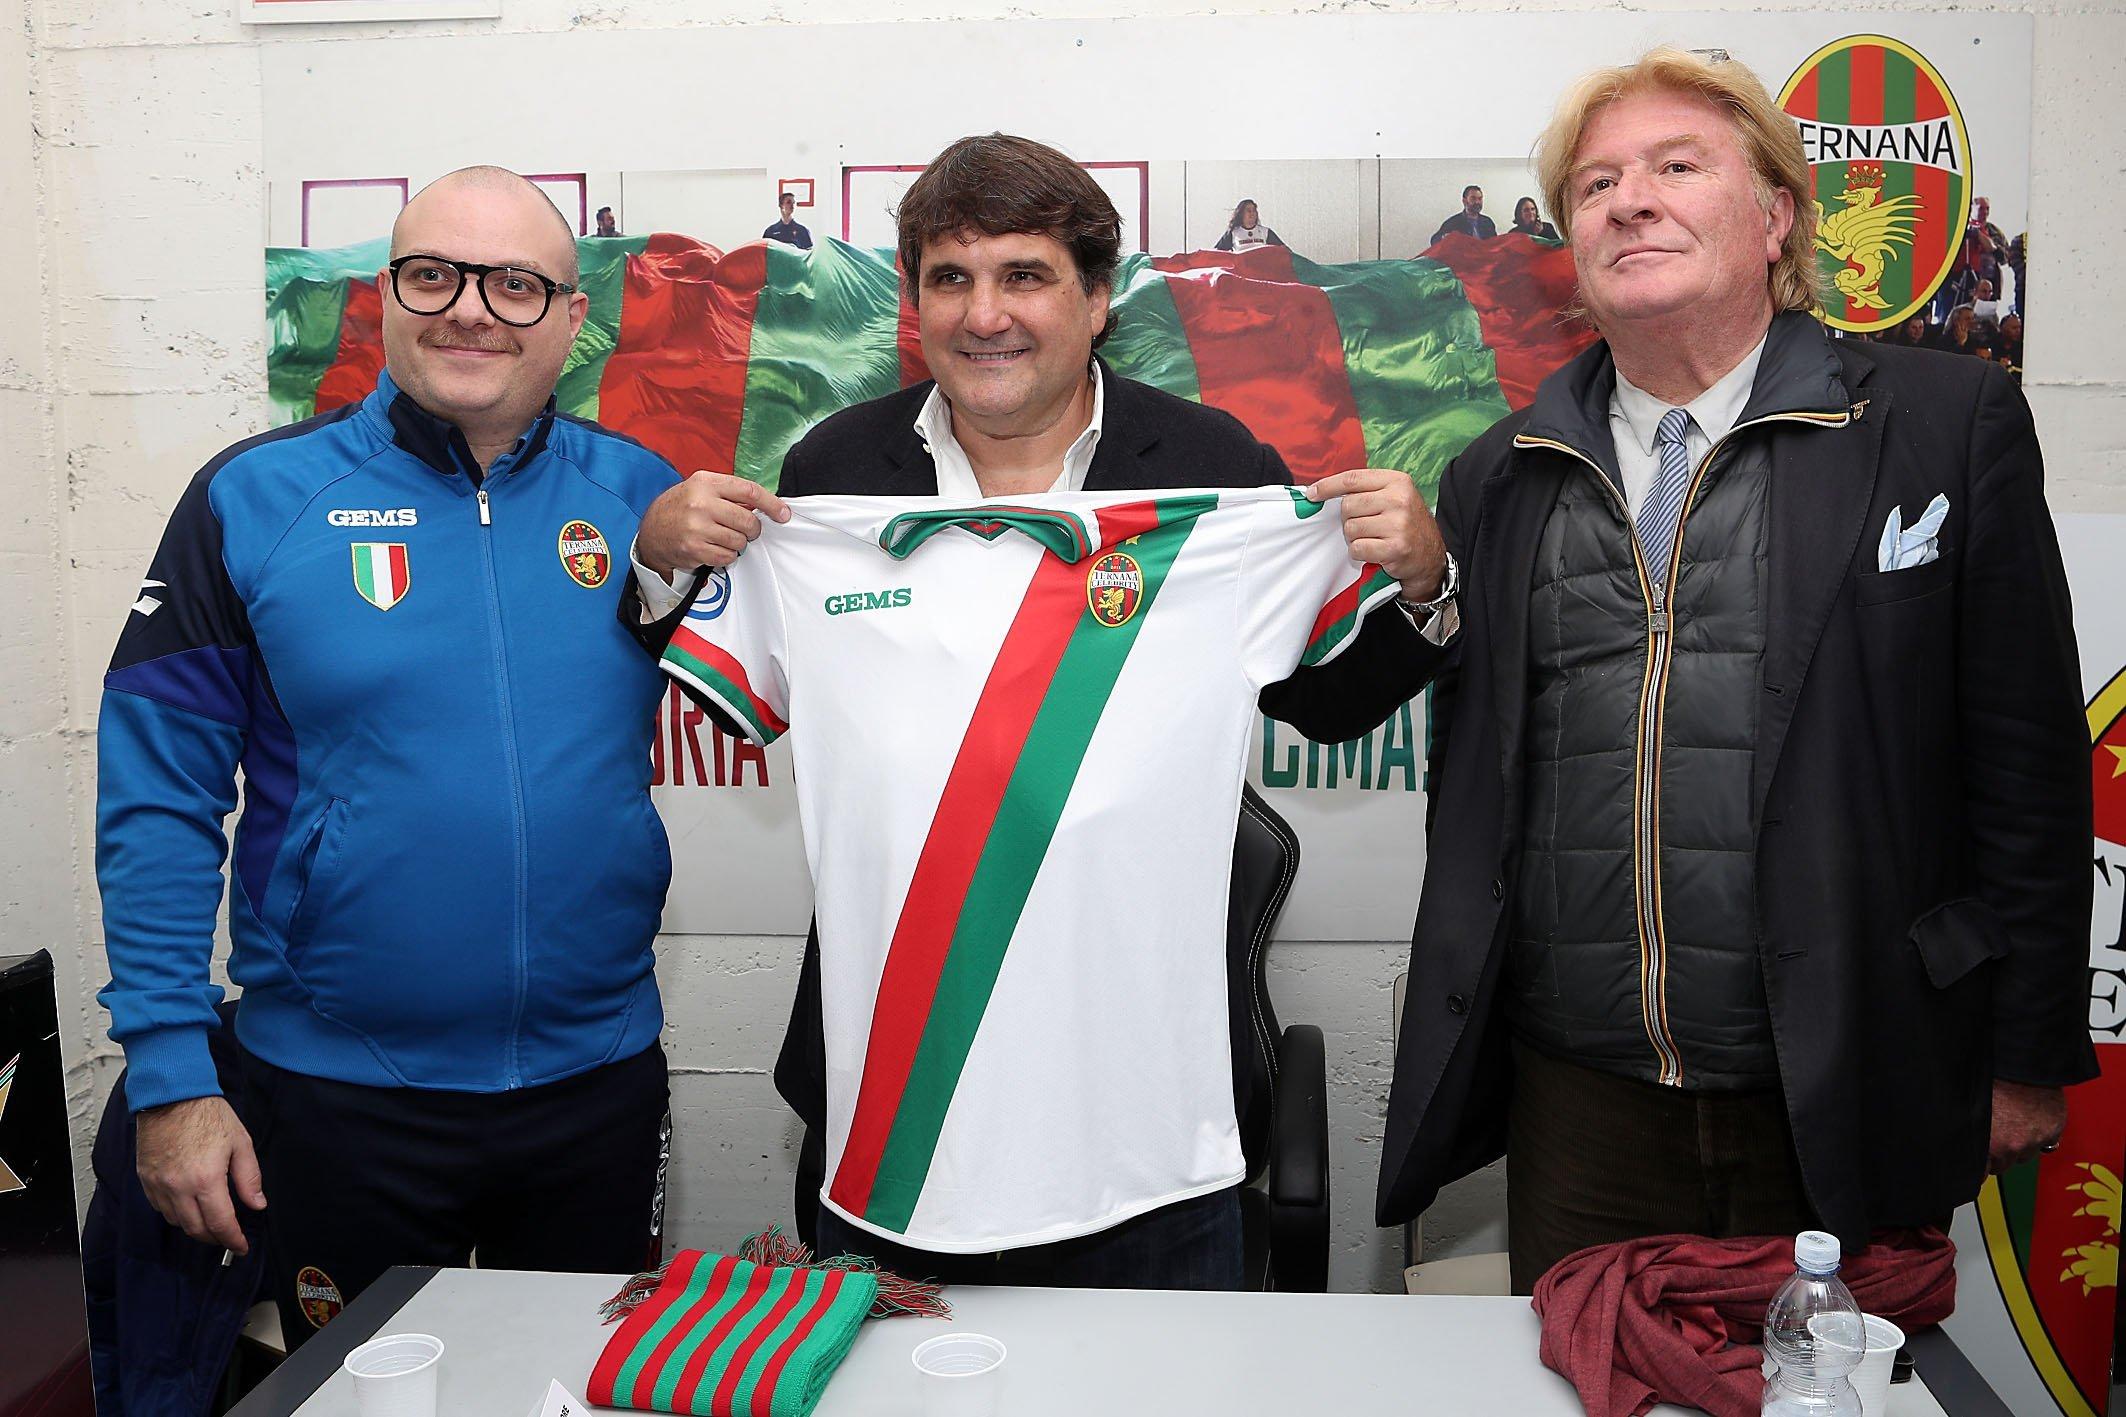 Daniele D'Orto Ternana Celebrity calcio femminile